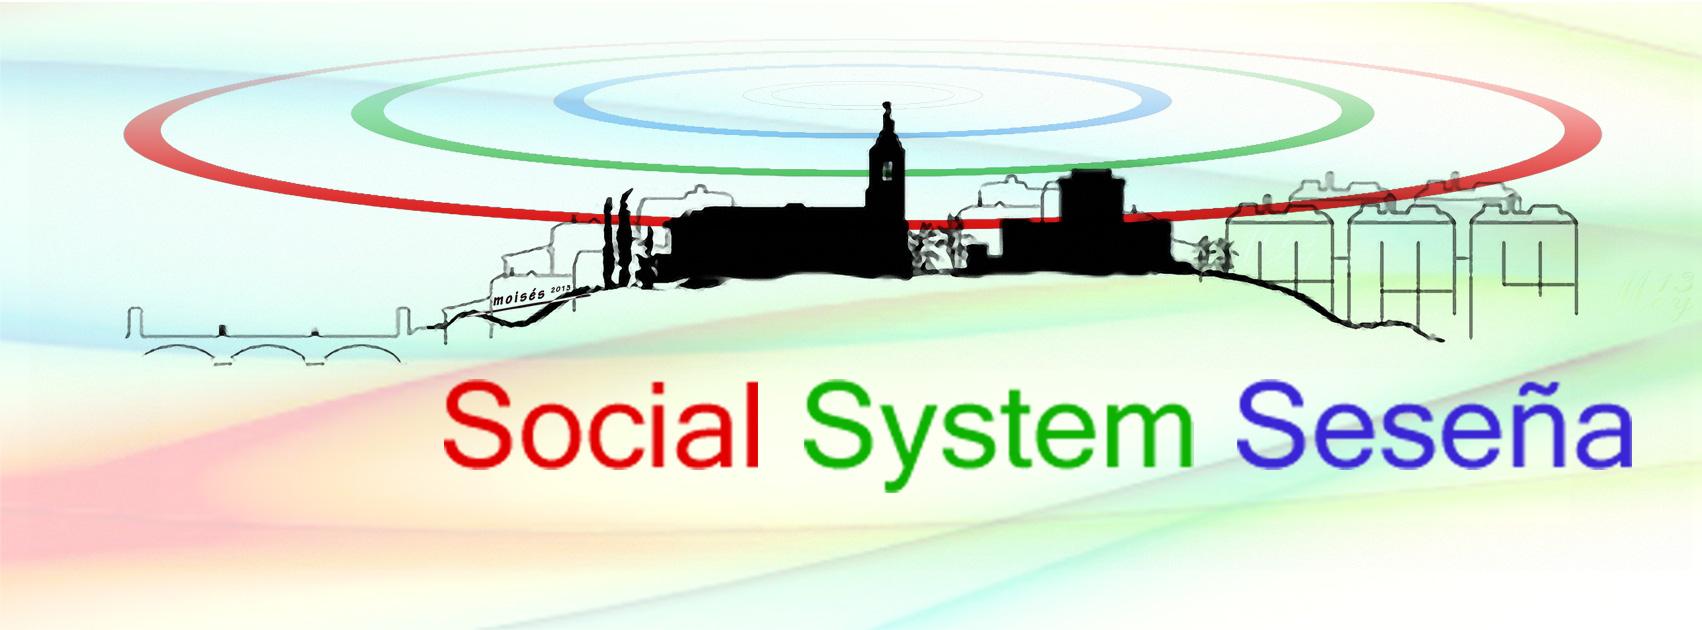 Social System Seseña